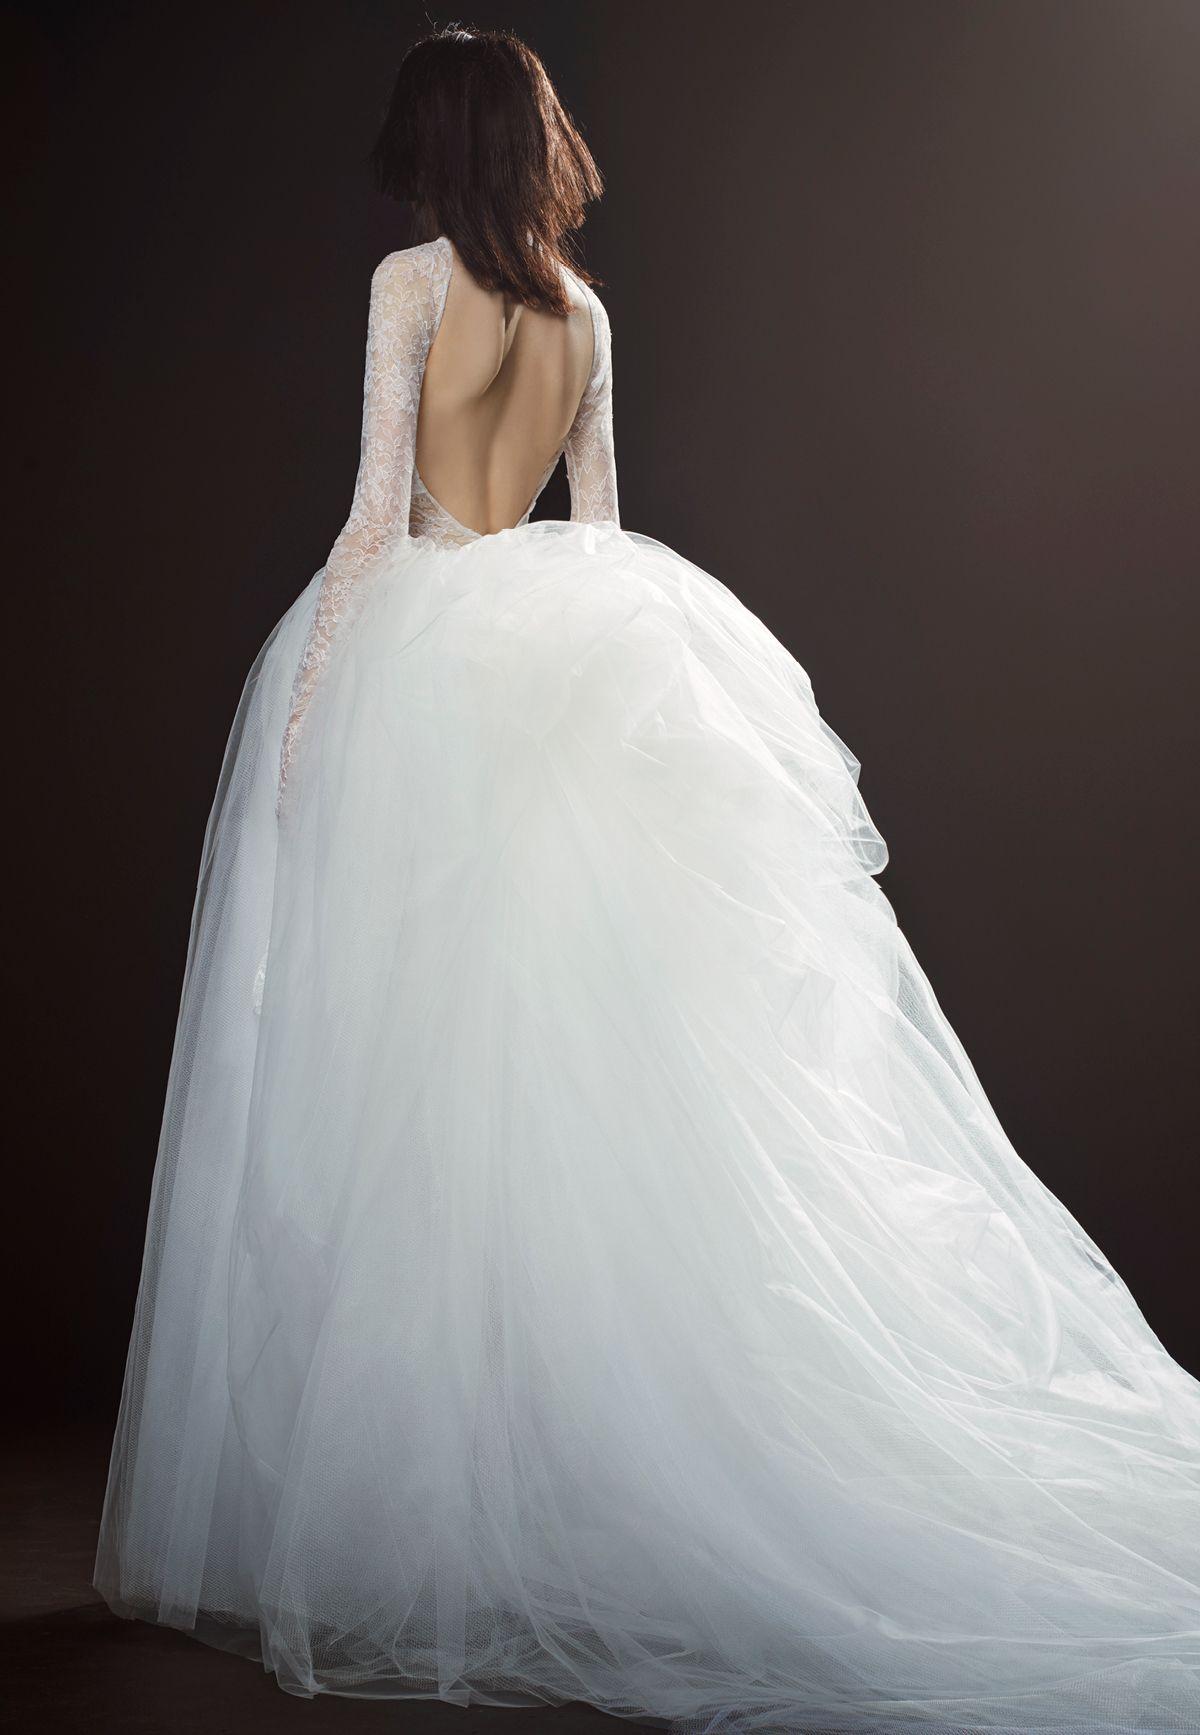 Silk sheath wedding dress  THÉRÈSE is a light ivory silk faille strapless Aline wedding gown